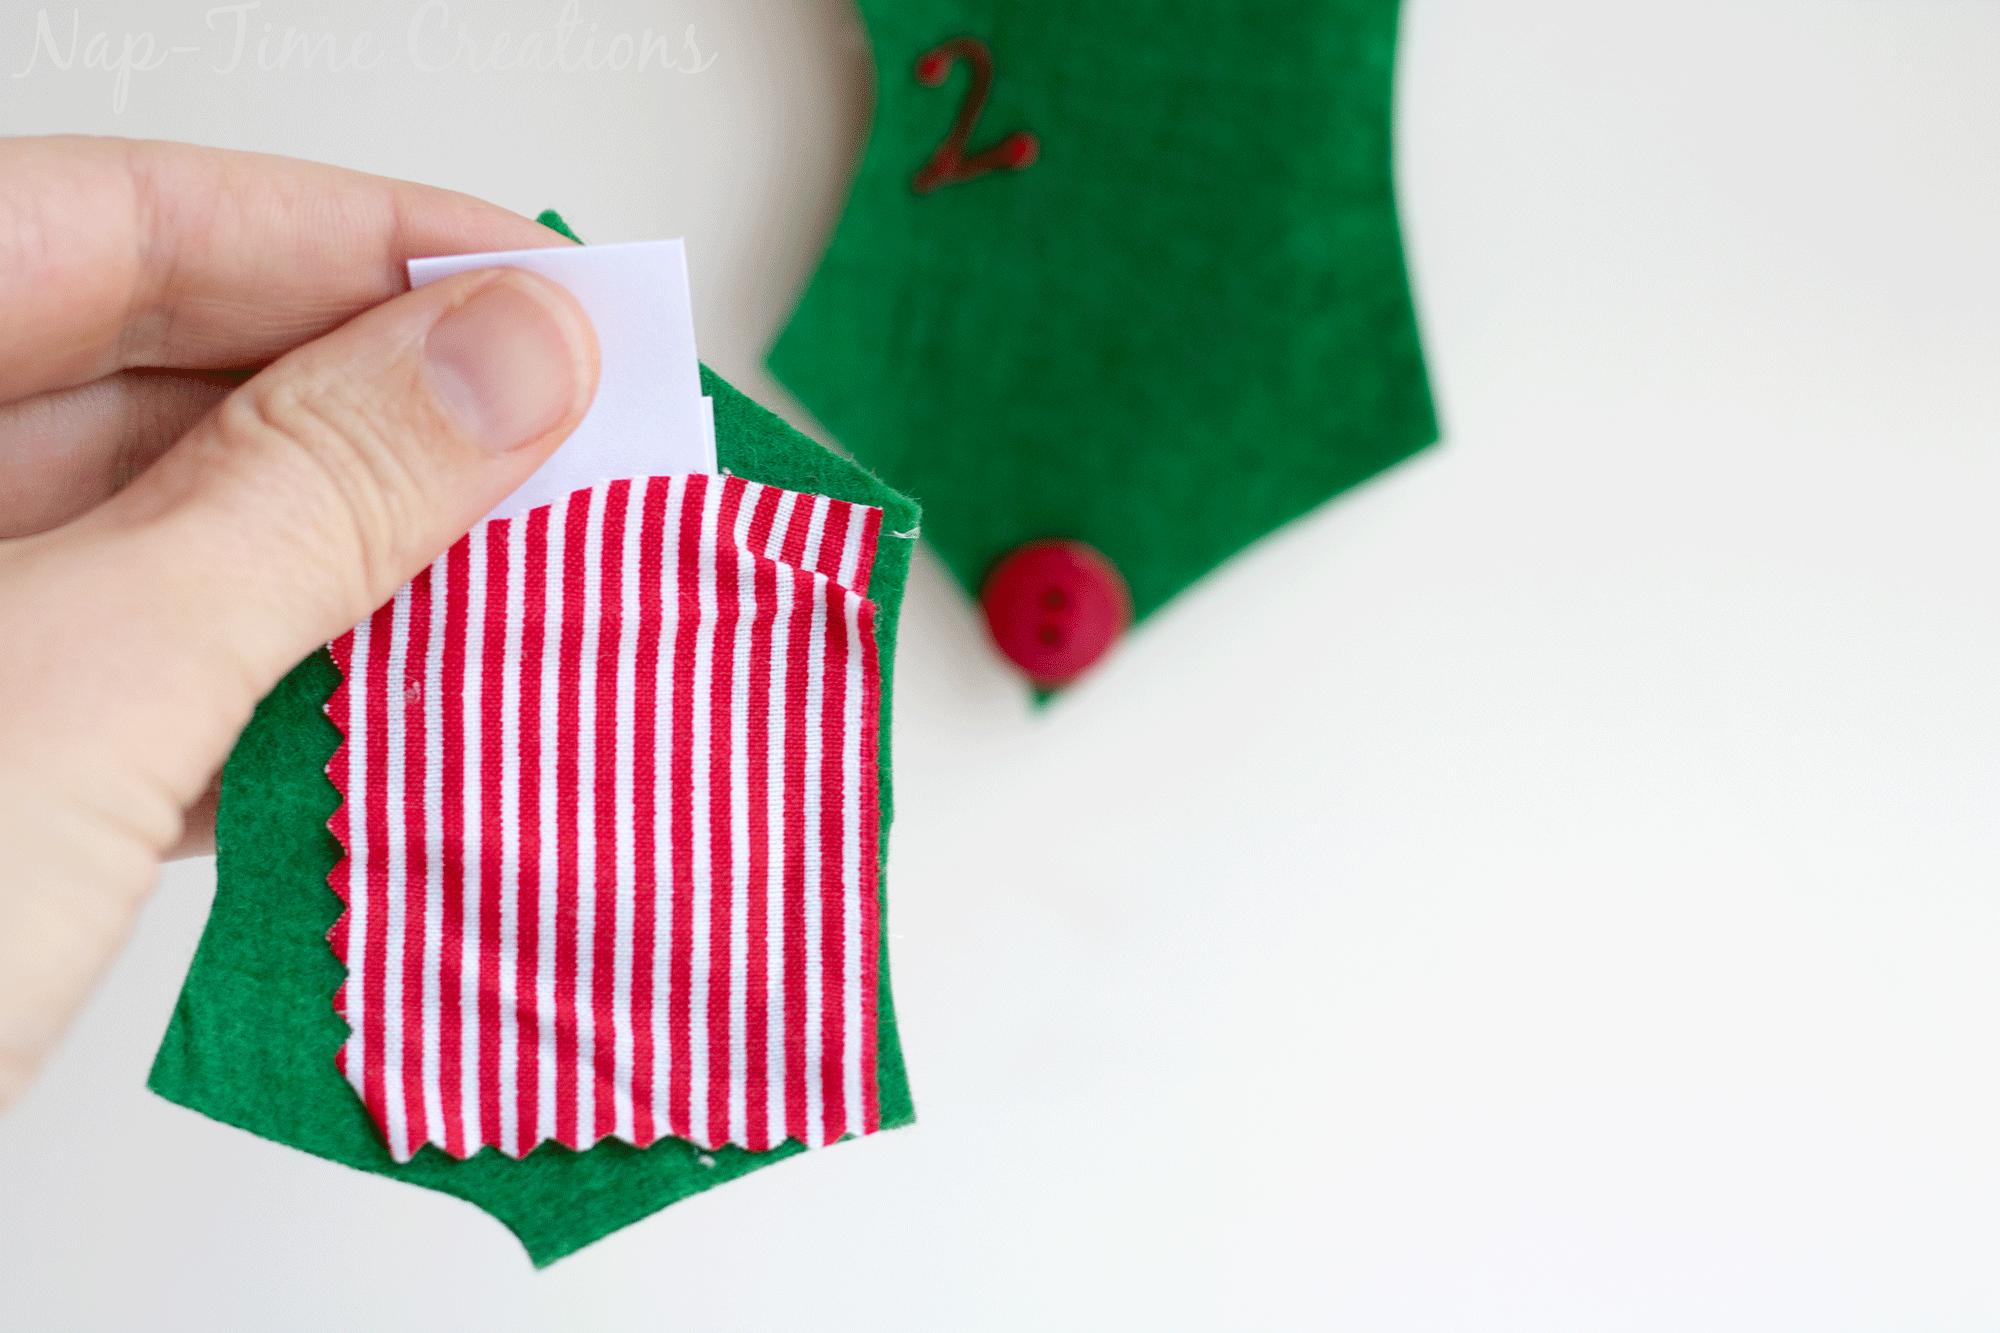 holly-jolly-christmas-countown-calendar-12